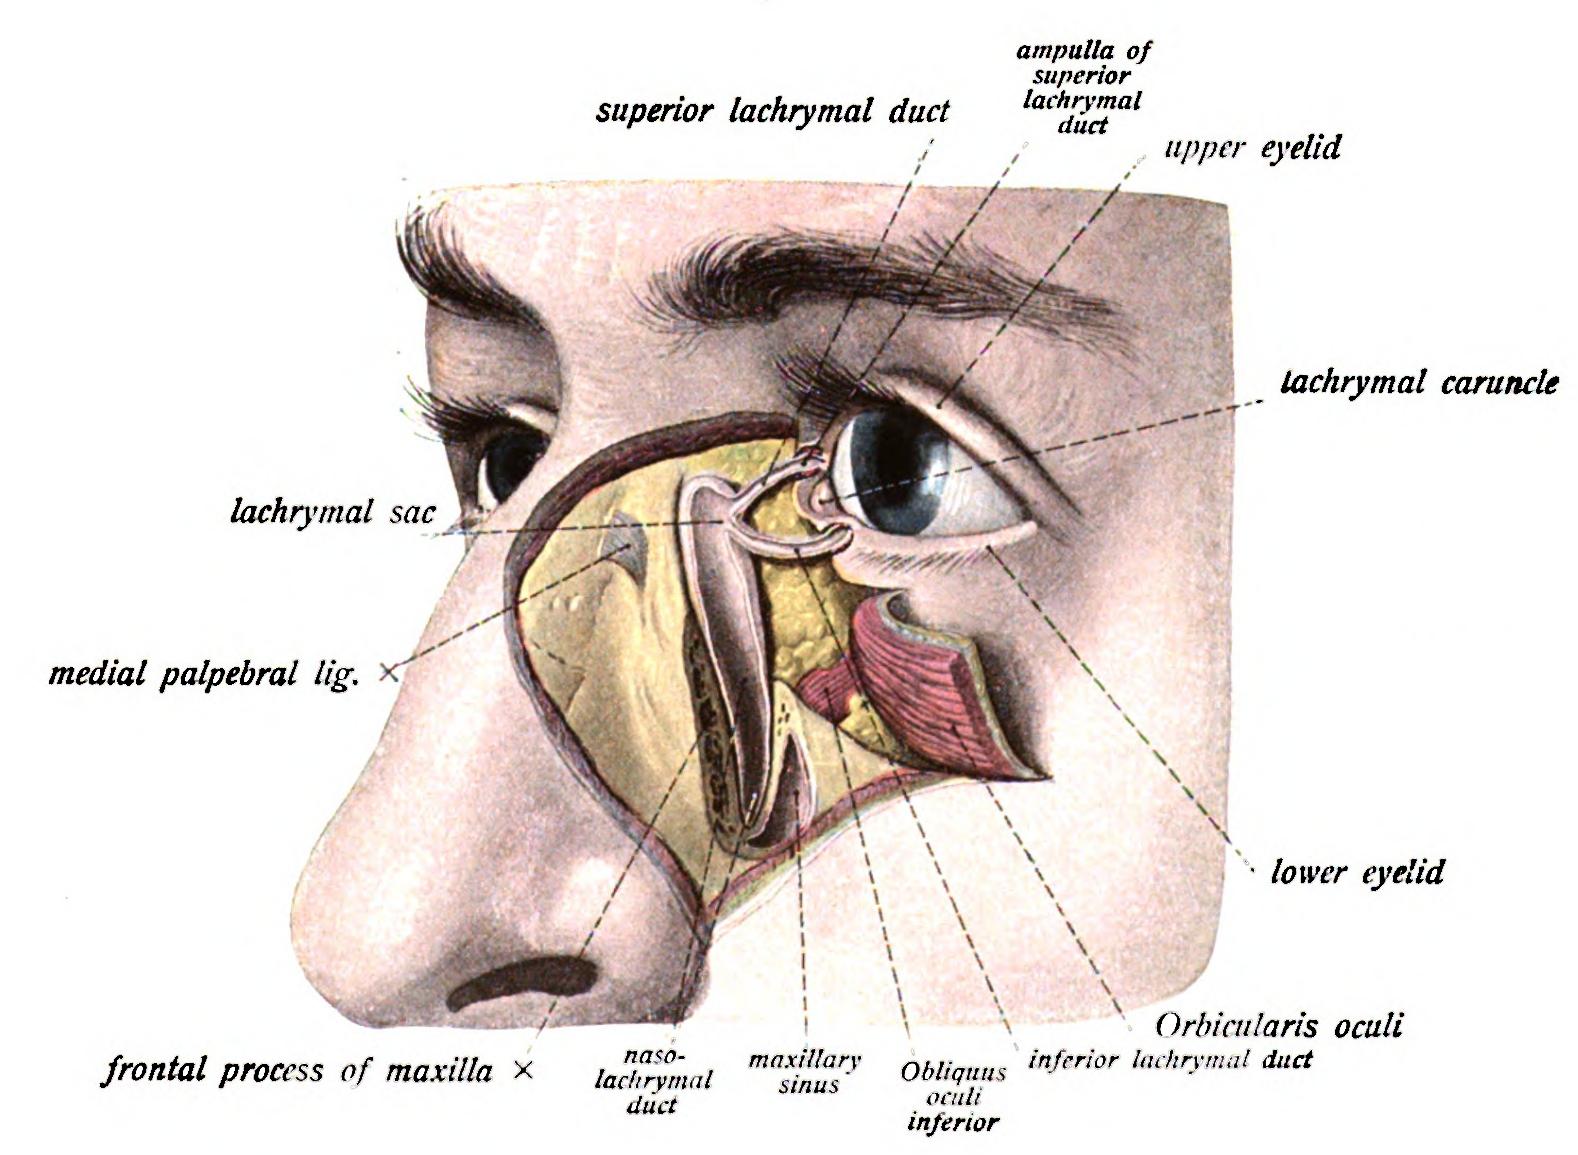 Figure 2. Lacrimal Anatomy. Courtesy of wikimedia commons (7).